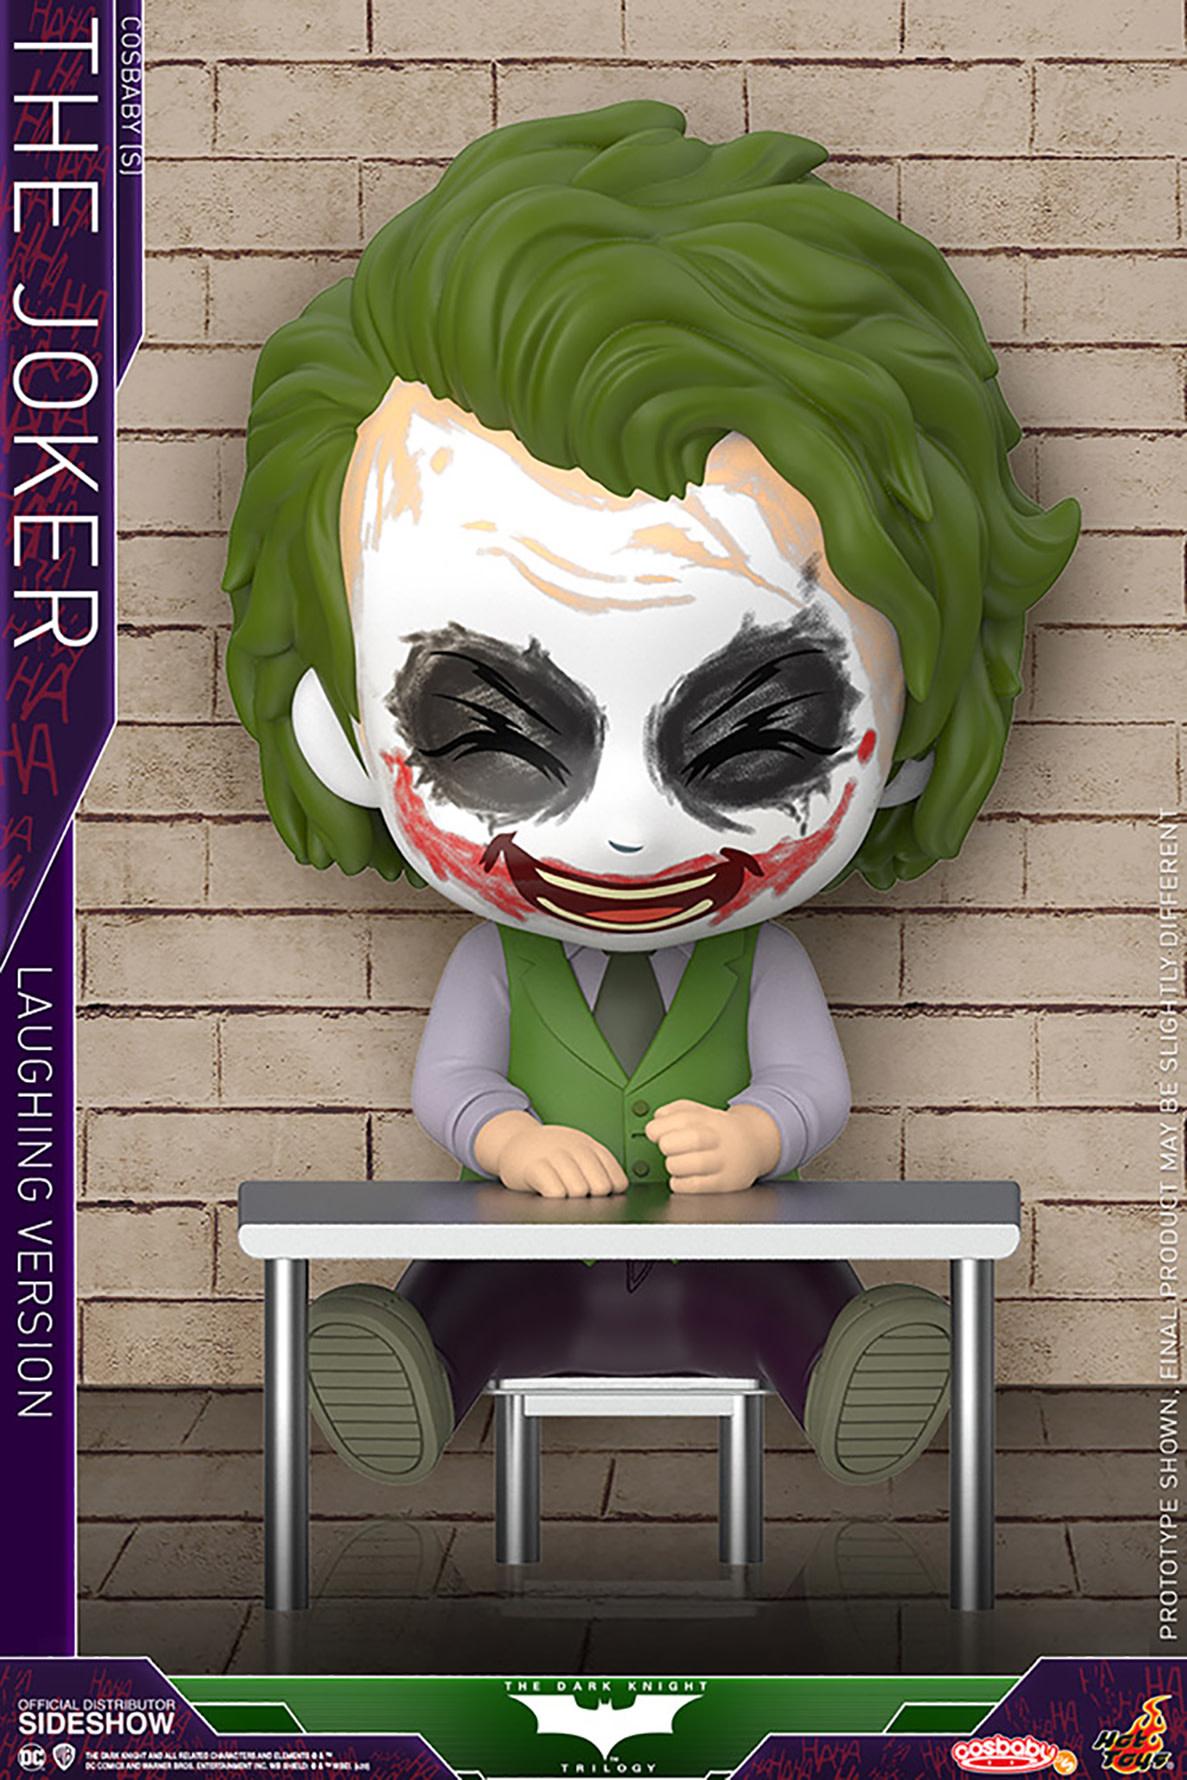 Hot Toy DC Comics: The Dark Knight Movie - Laughing Joker Cosbaby